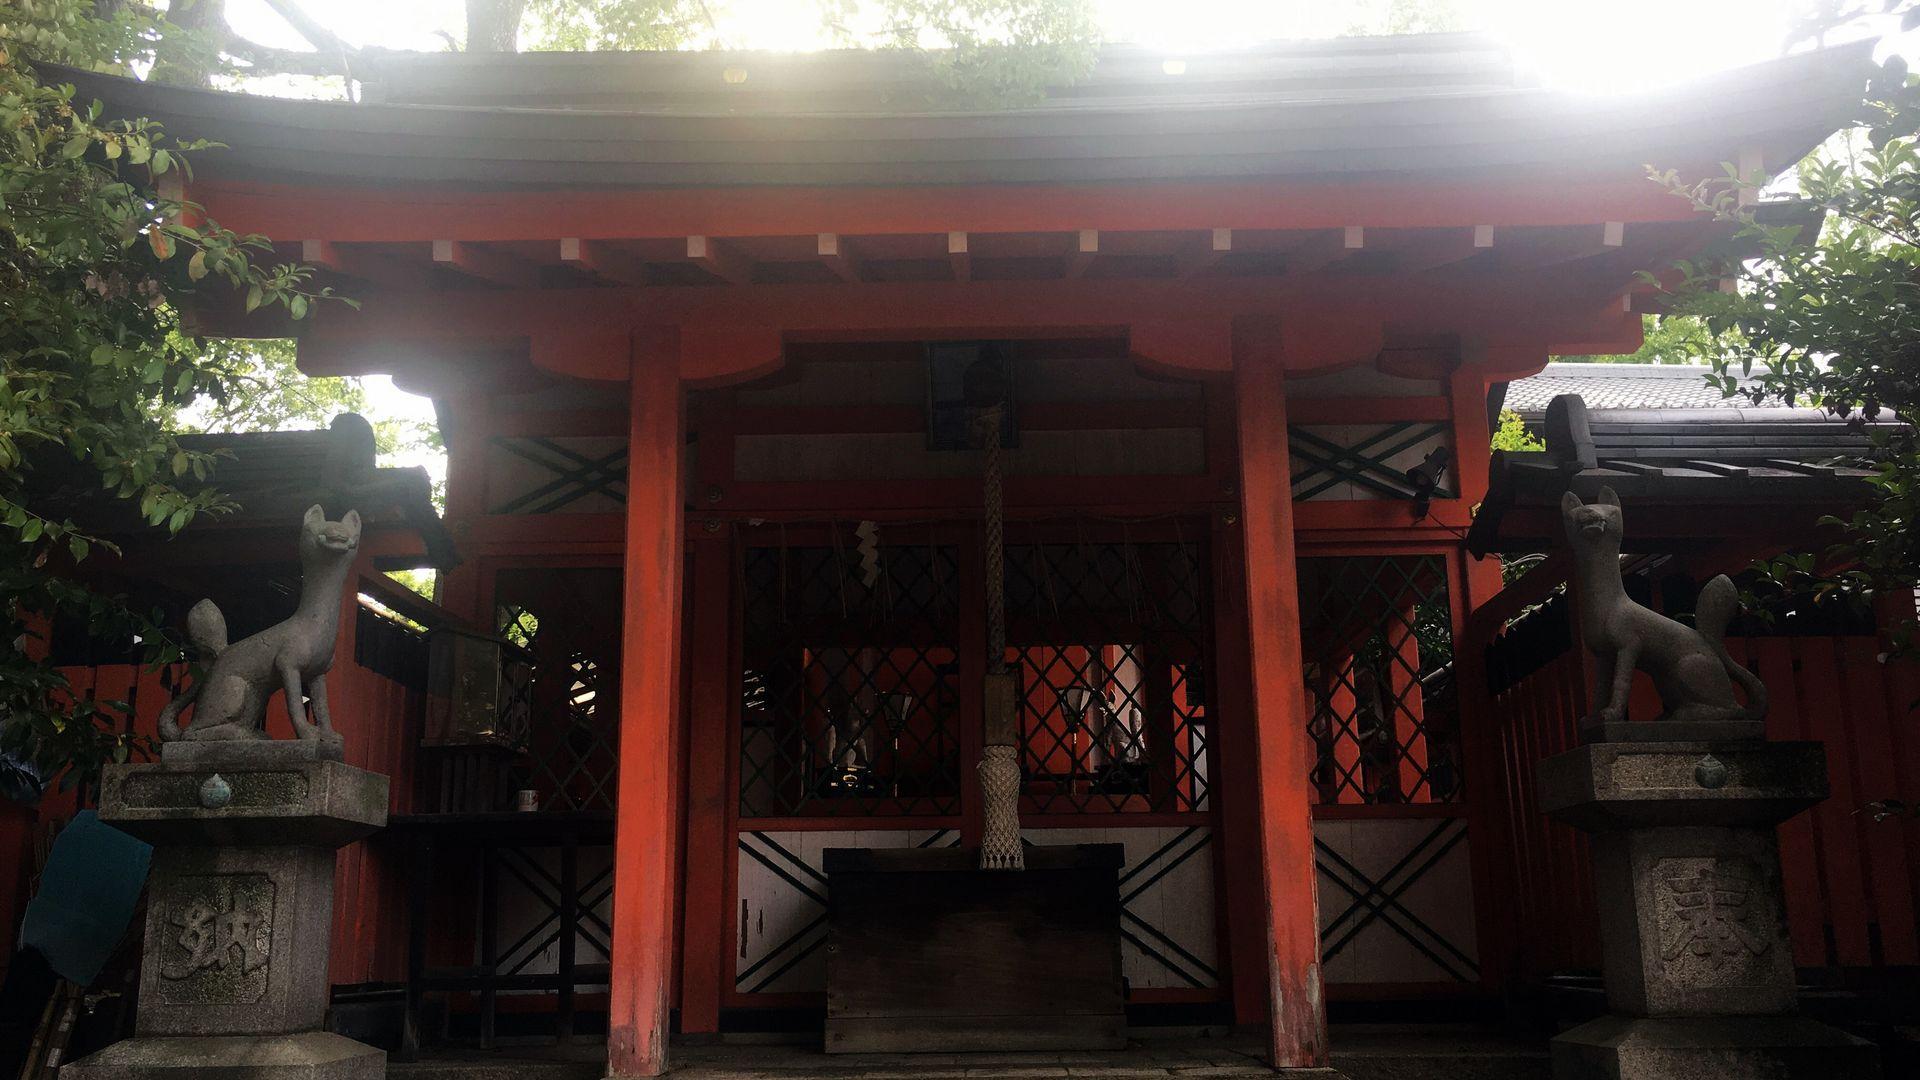 藤森神社の藤森稲荷社